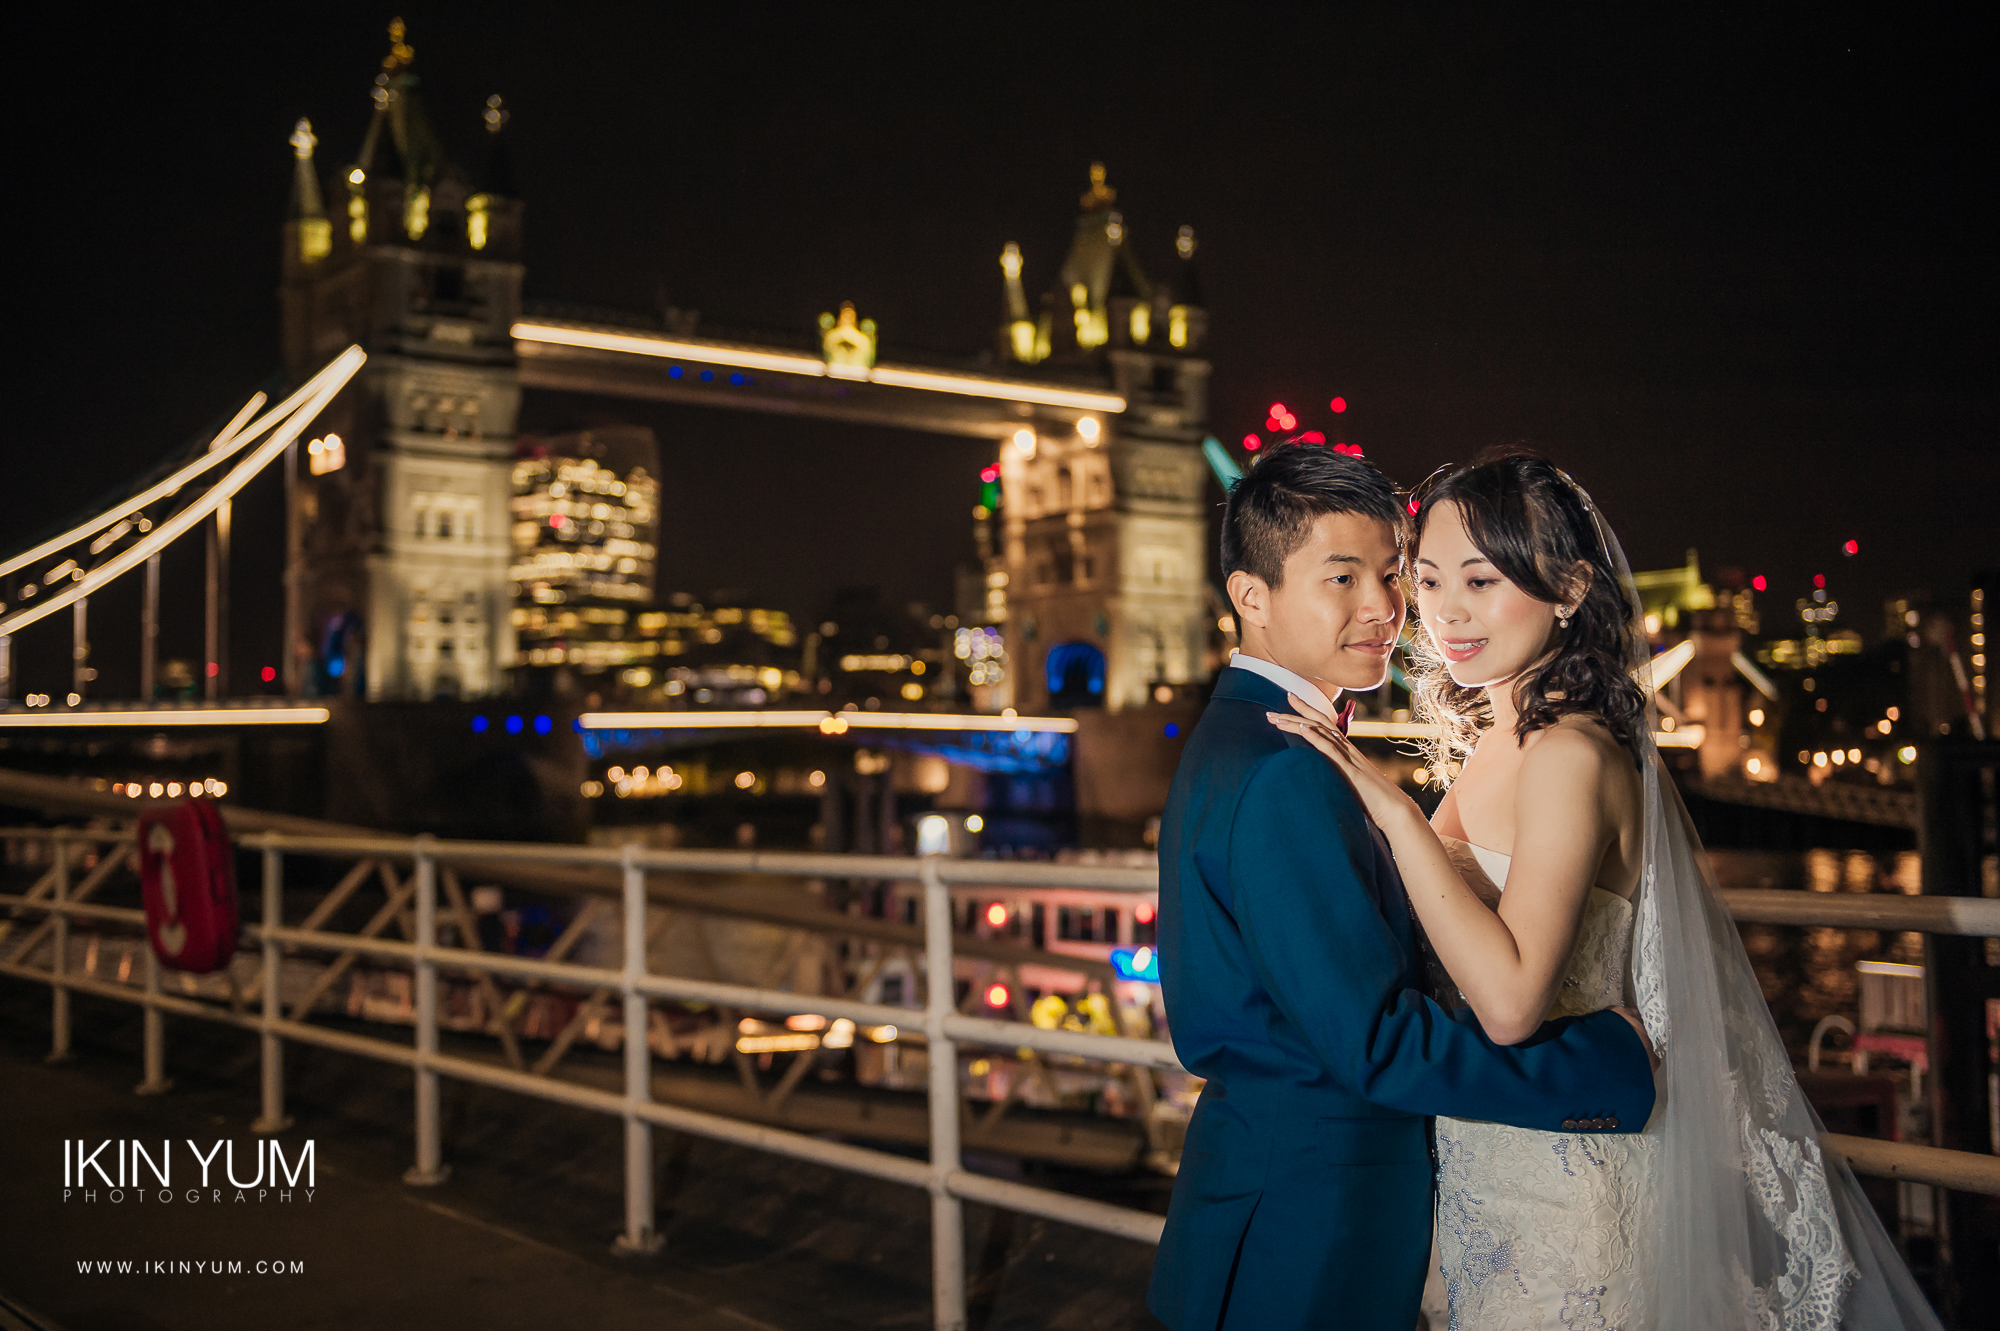 Chloe & Carlos Pre-Wedding Shoot- Ikin Yum Photography-0157.jpg